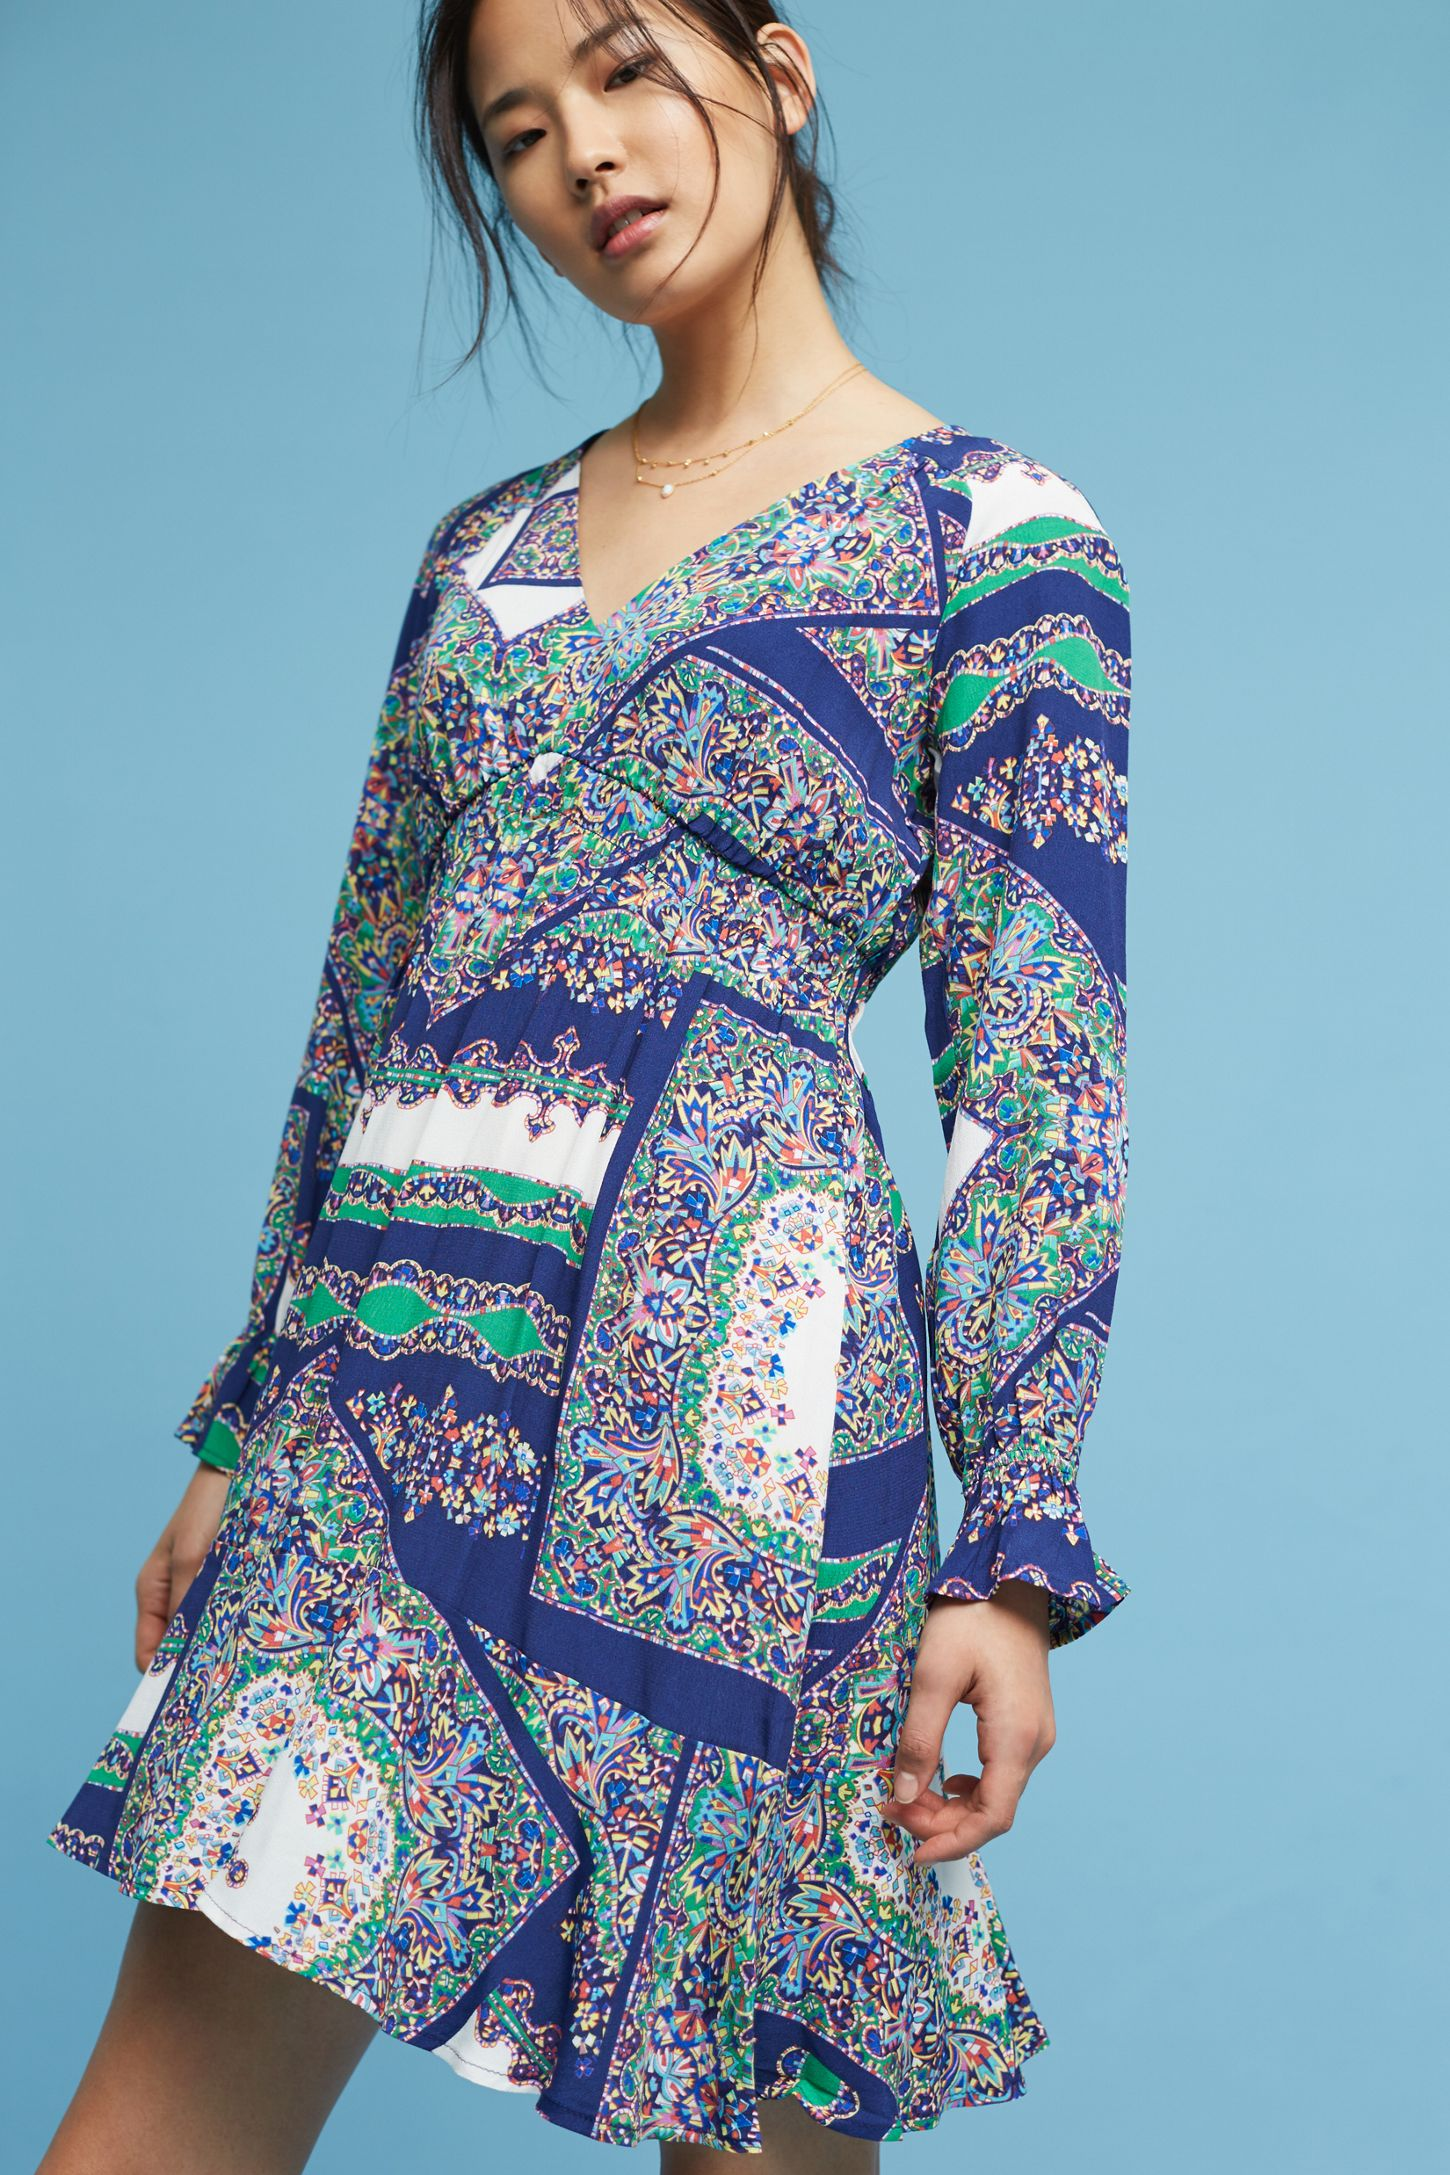 678d395b4cf21 Monaco Dress | Anthropologie